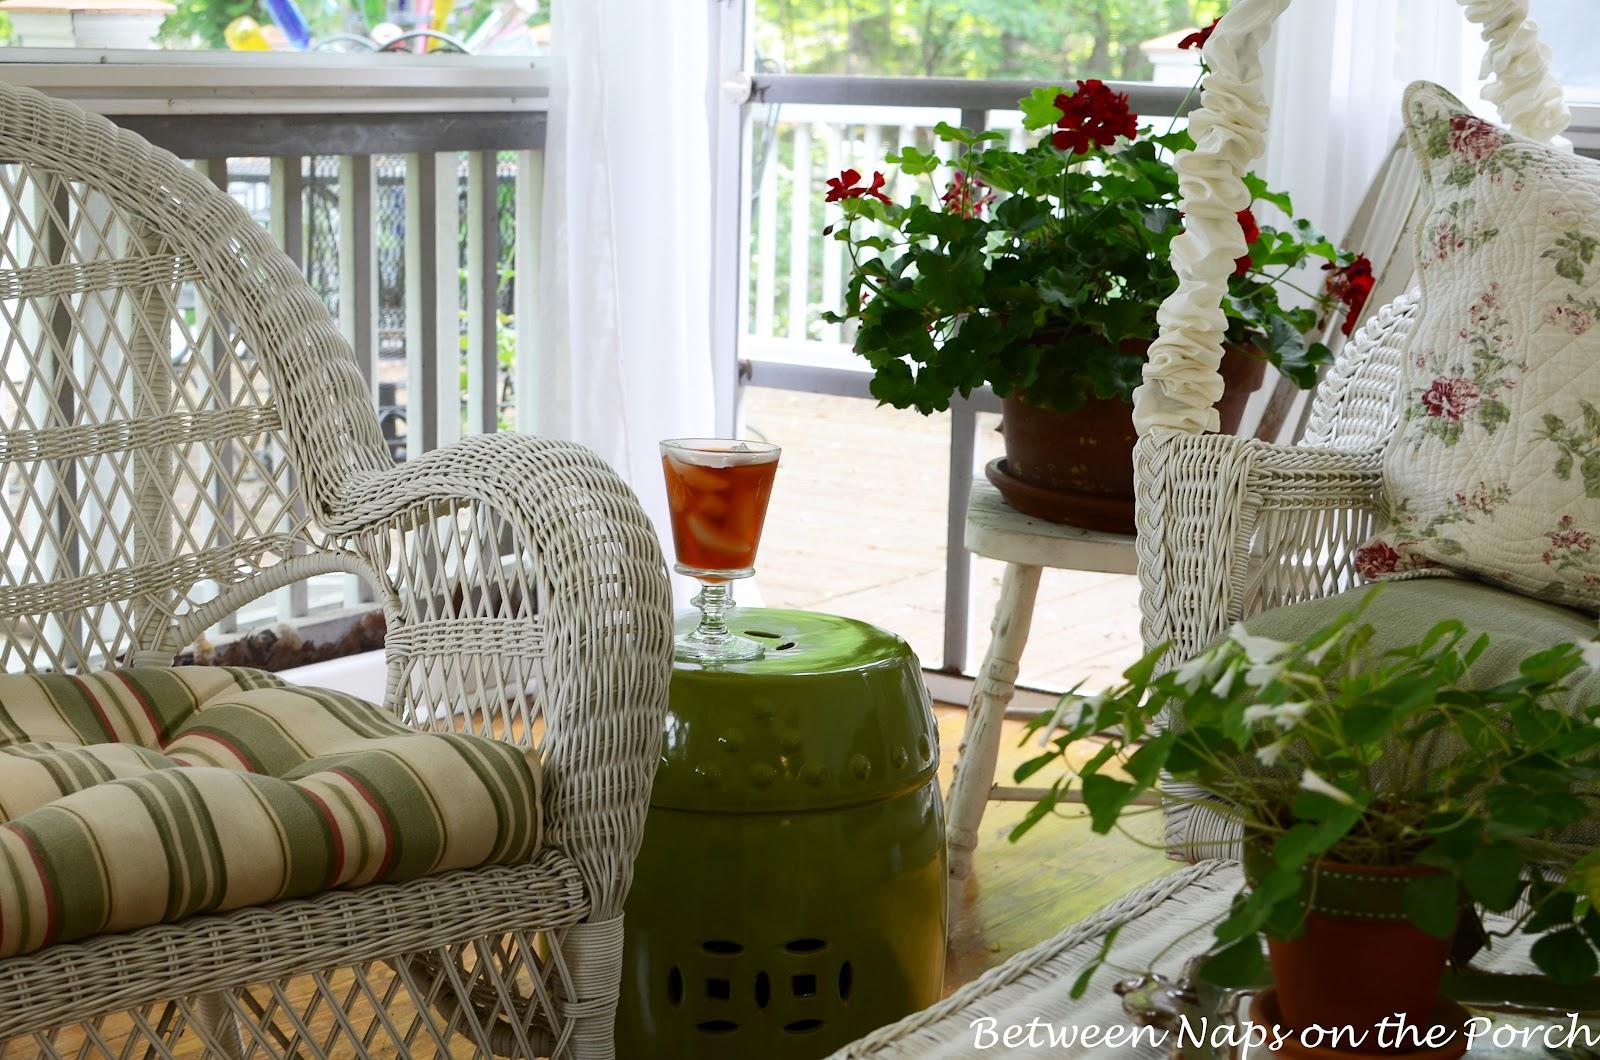 Barrel Shaped, Green Garden Seat, Garden Stool